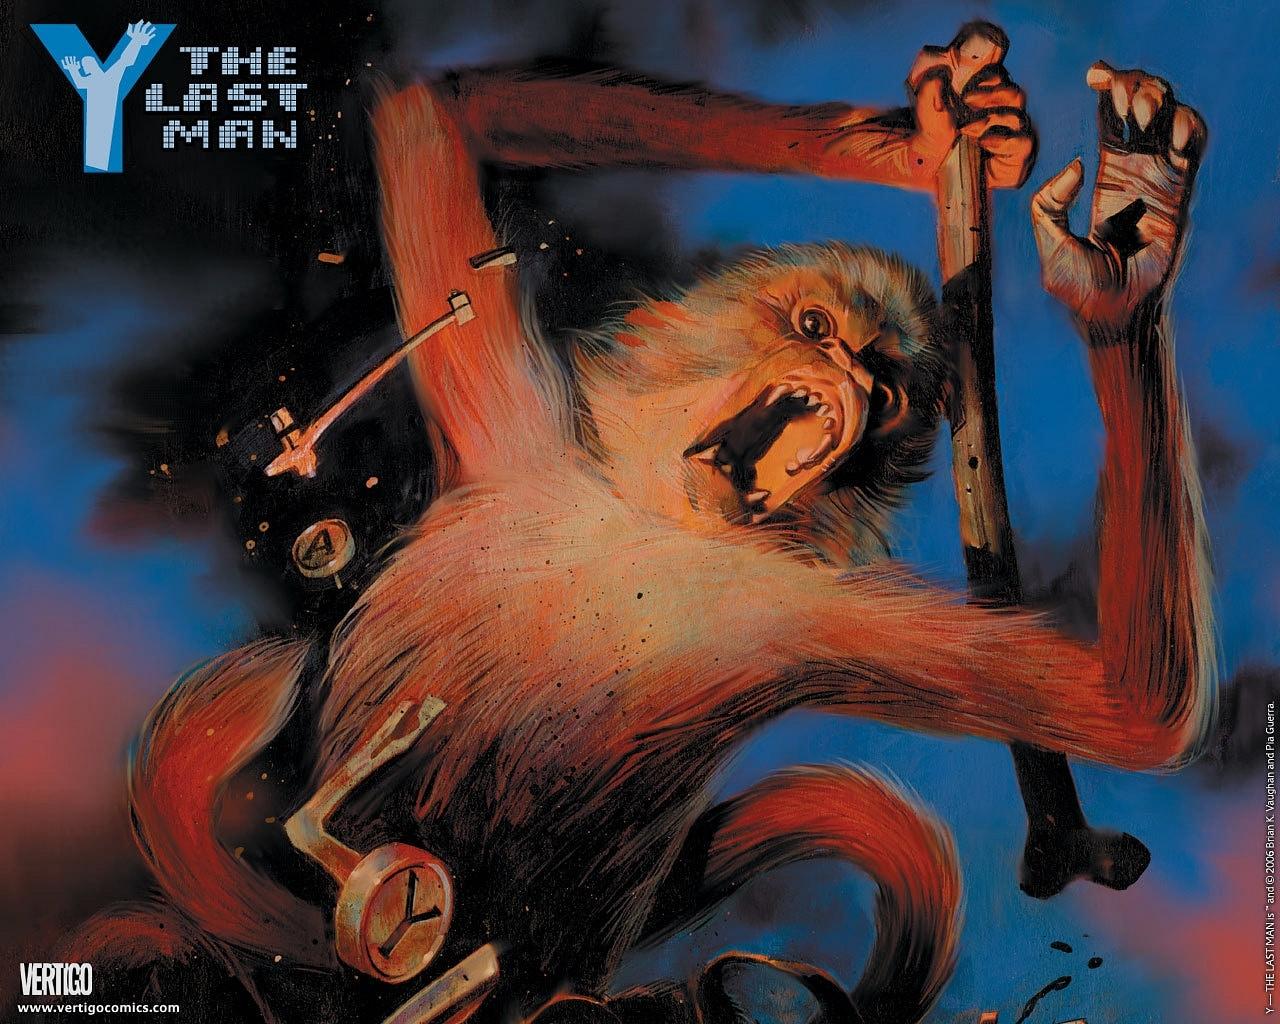 4. The Last Man